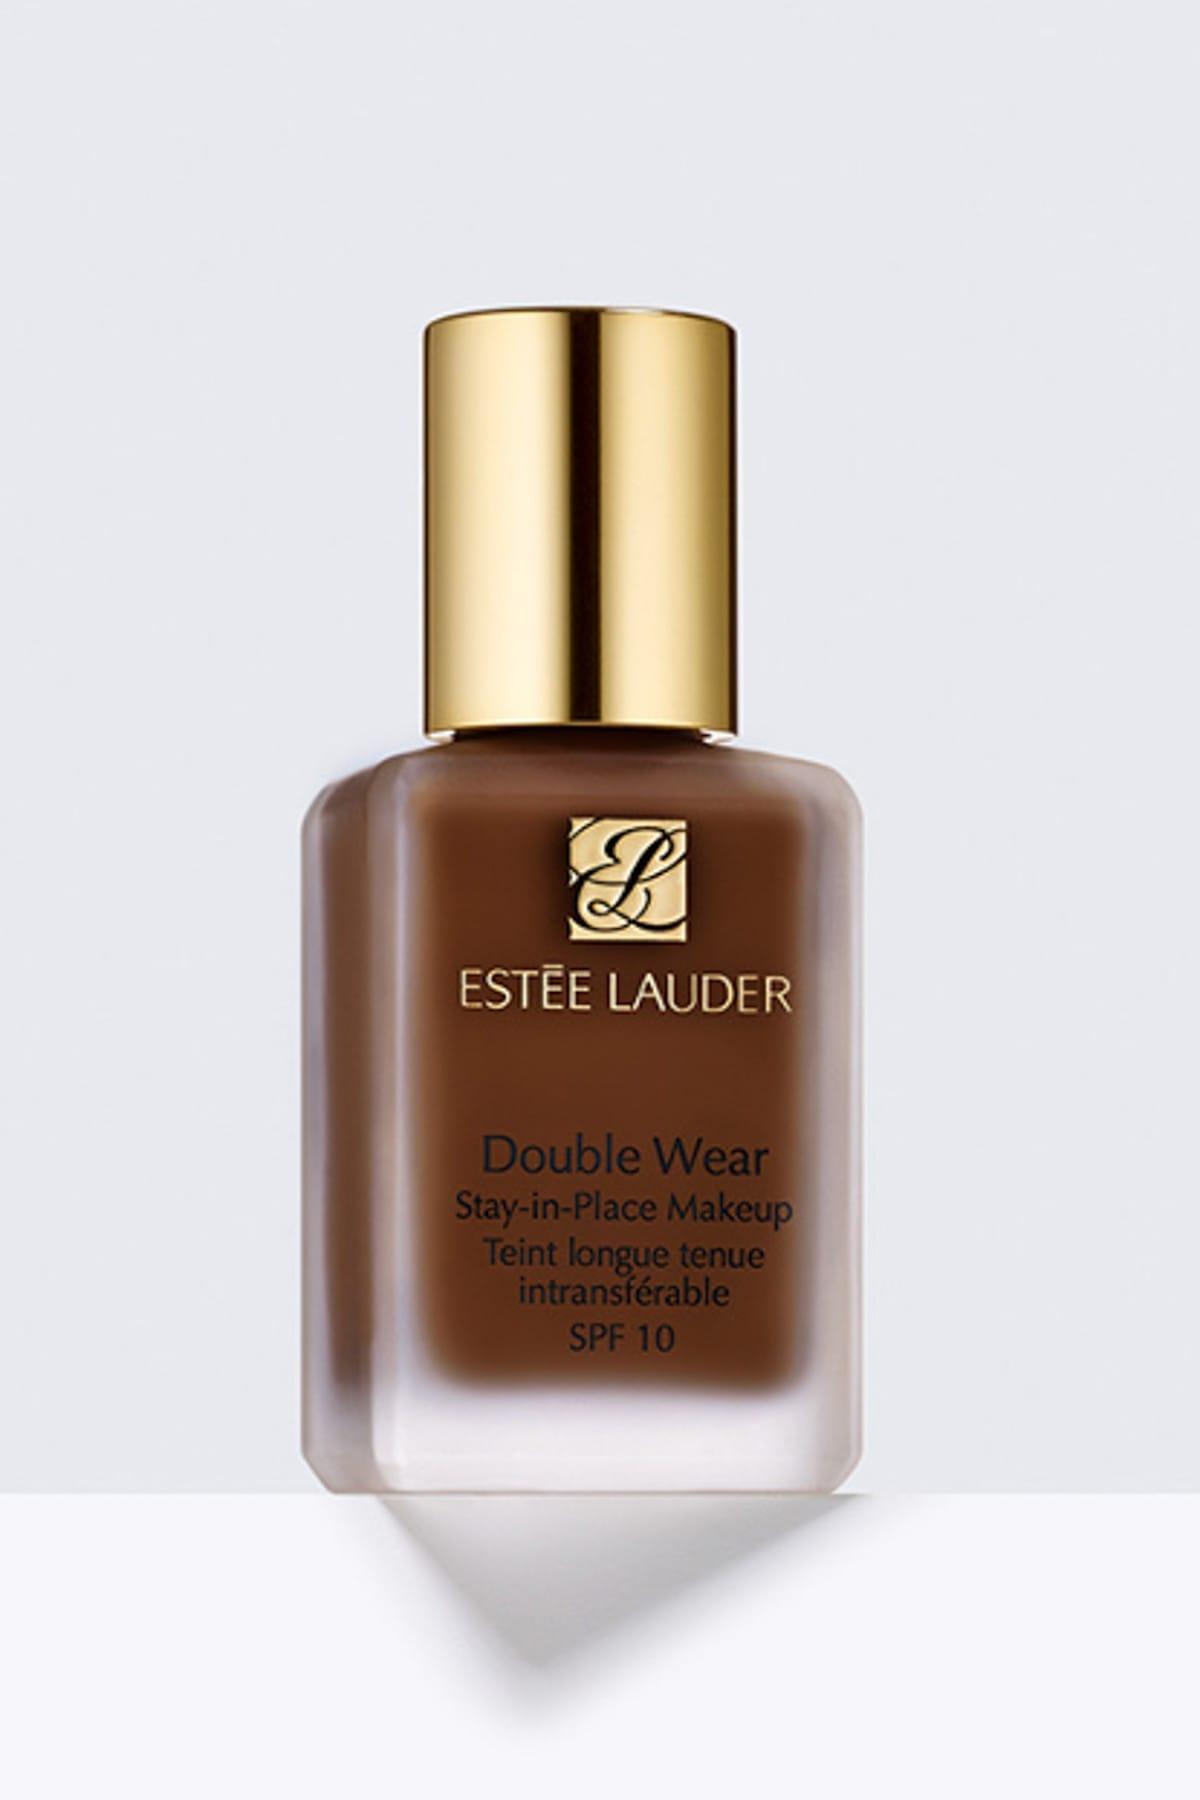 Estee Lauder Fondöten - Double Wear Foundation S.I.P Spf10 8C1 Rich Java 30 ml 887167442870 1